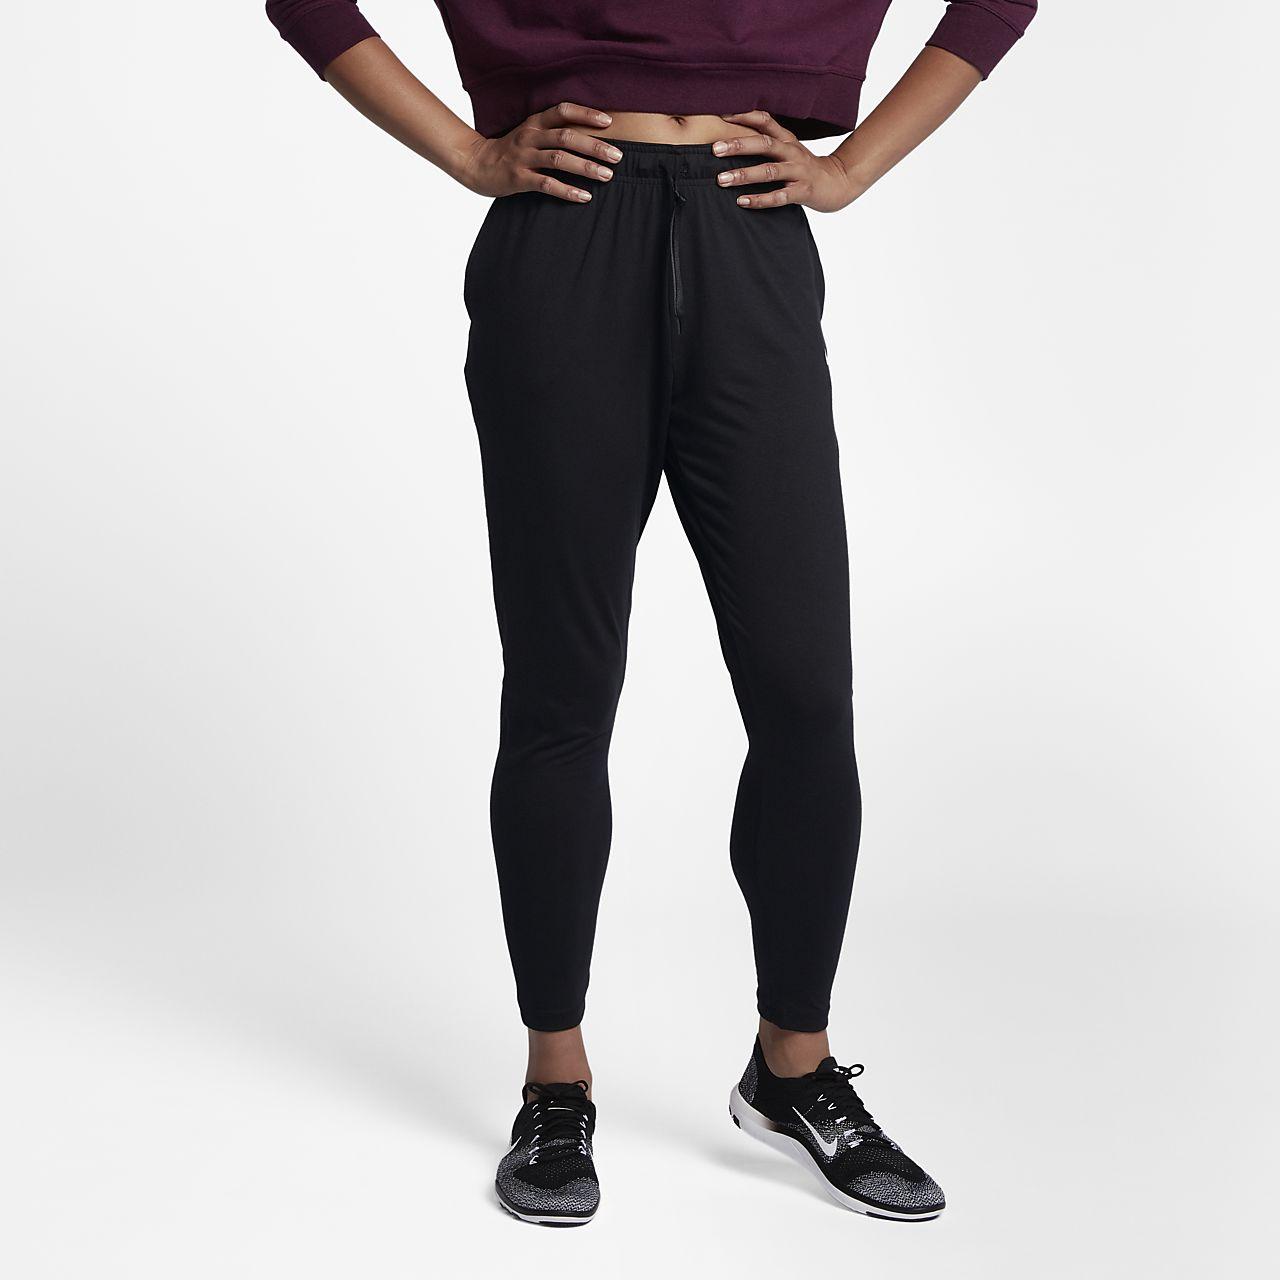 Victory De Femme Training Nike Pantalon Fr Flow Qfuc4s Pour eIYWE9DH2